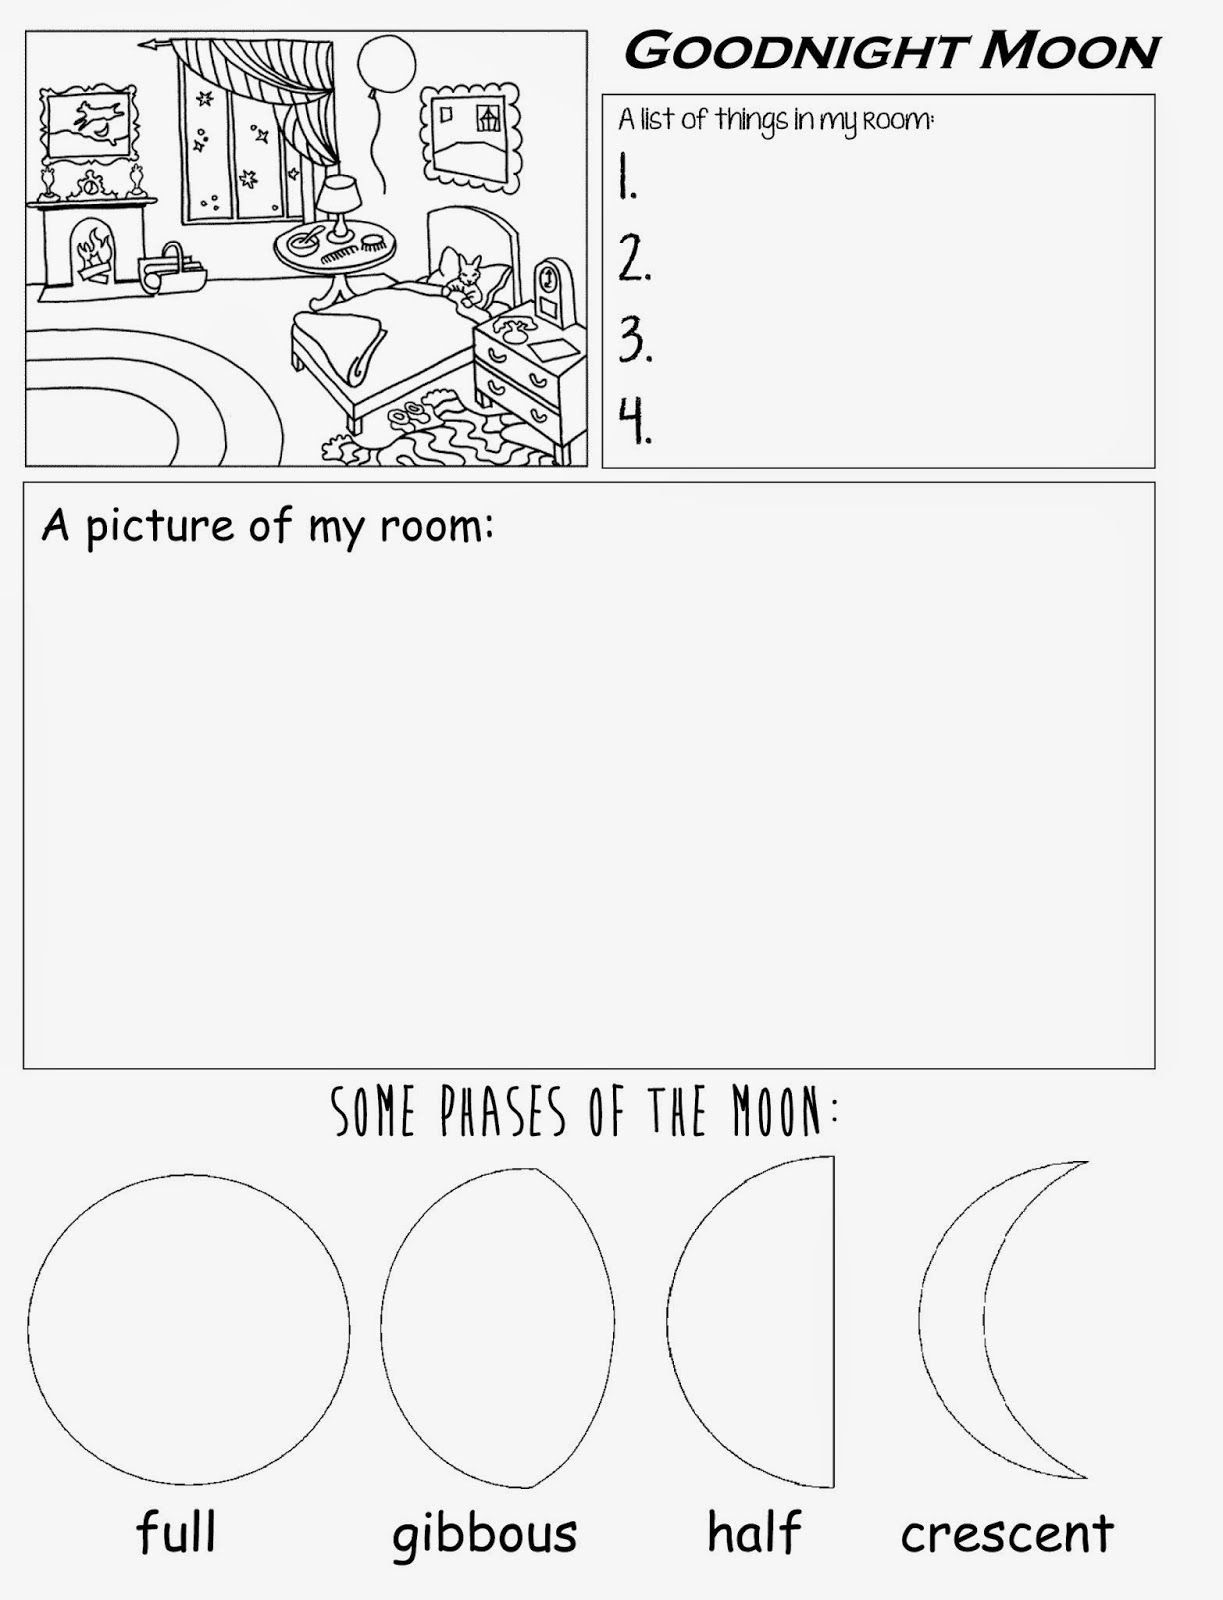 Moon Phases Worksheet 5th Grade Good Night Moon Worksheet